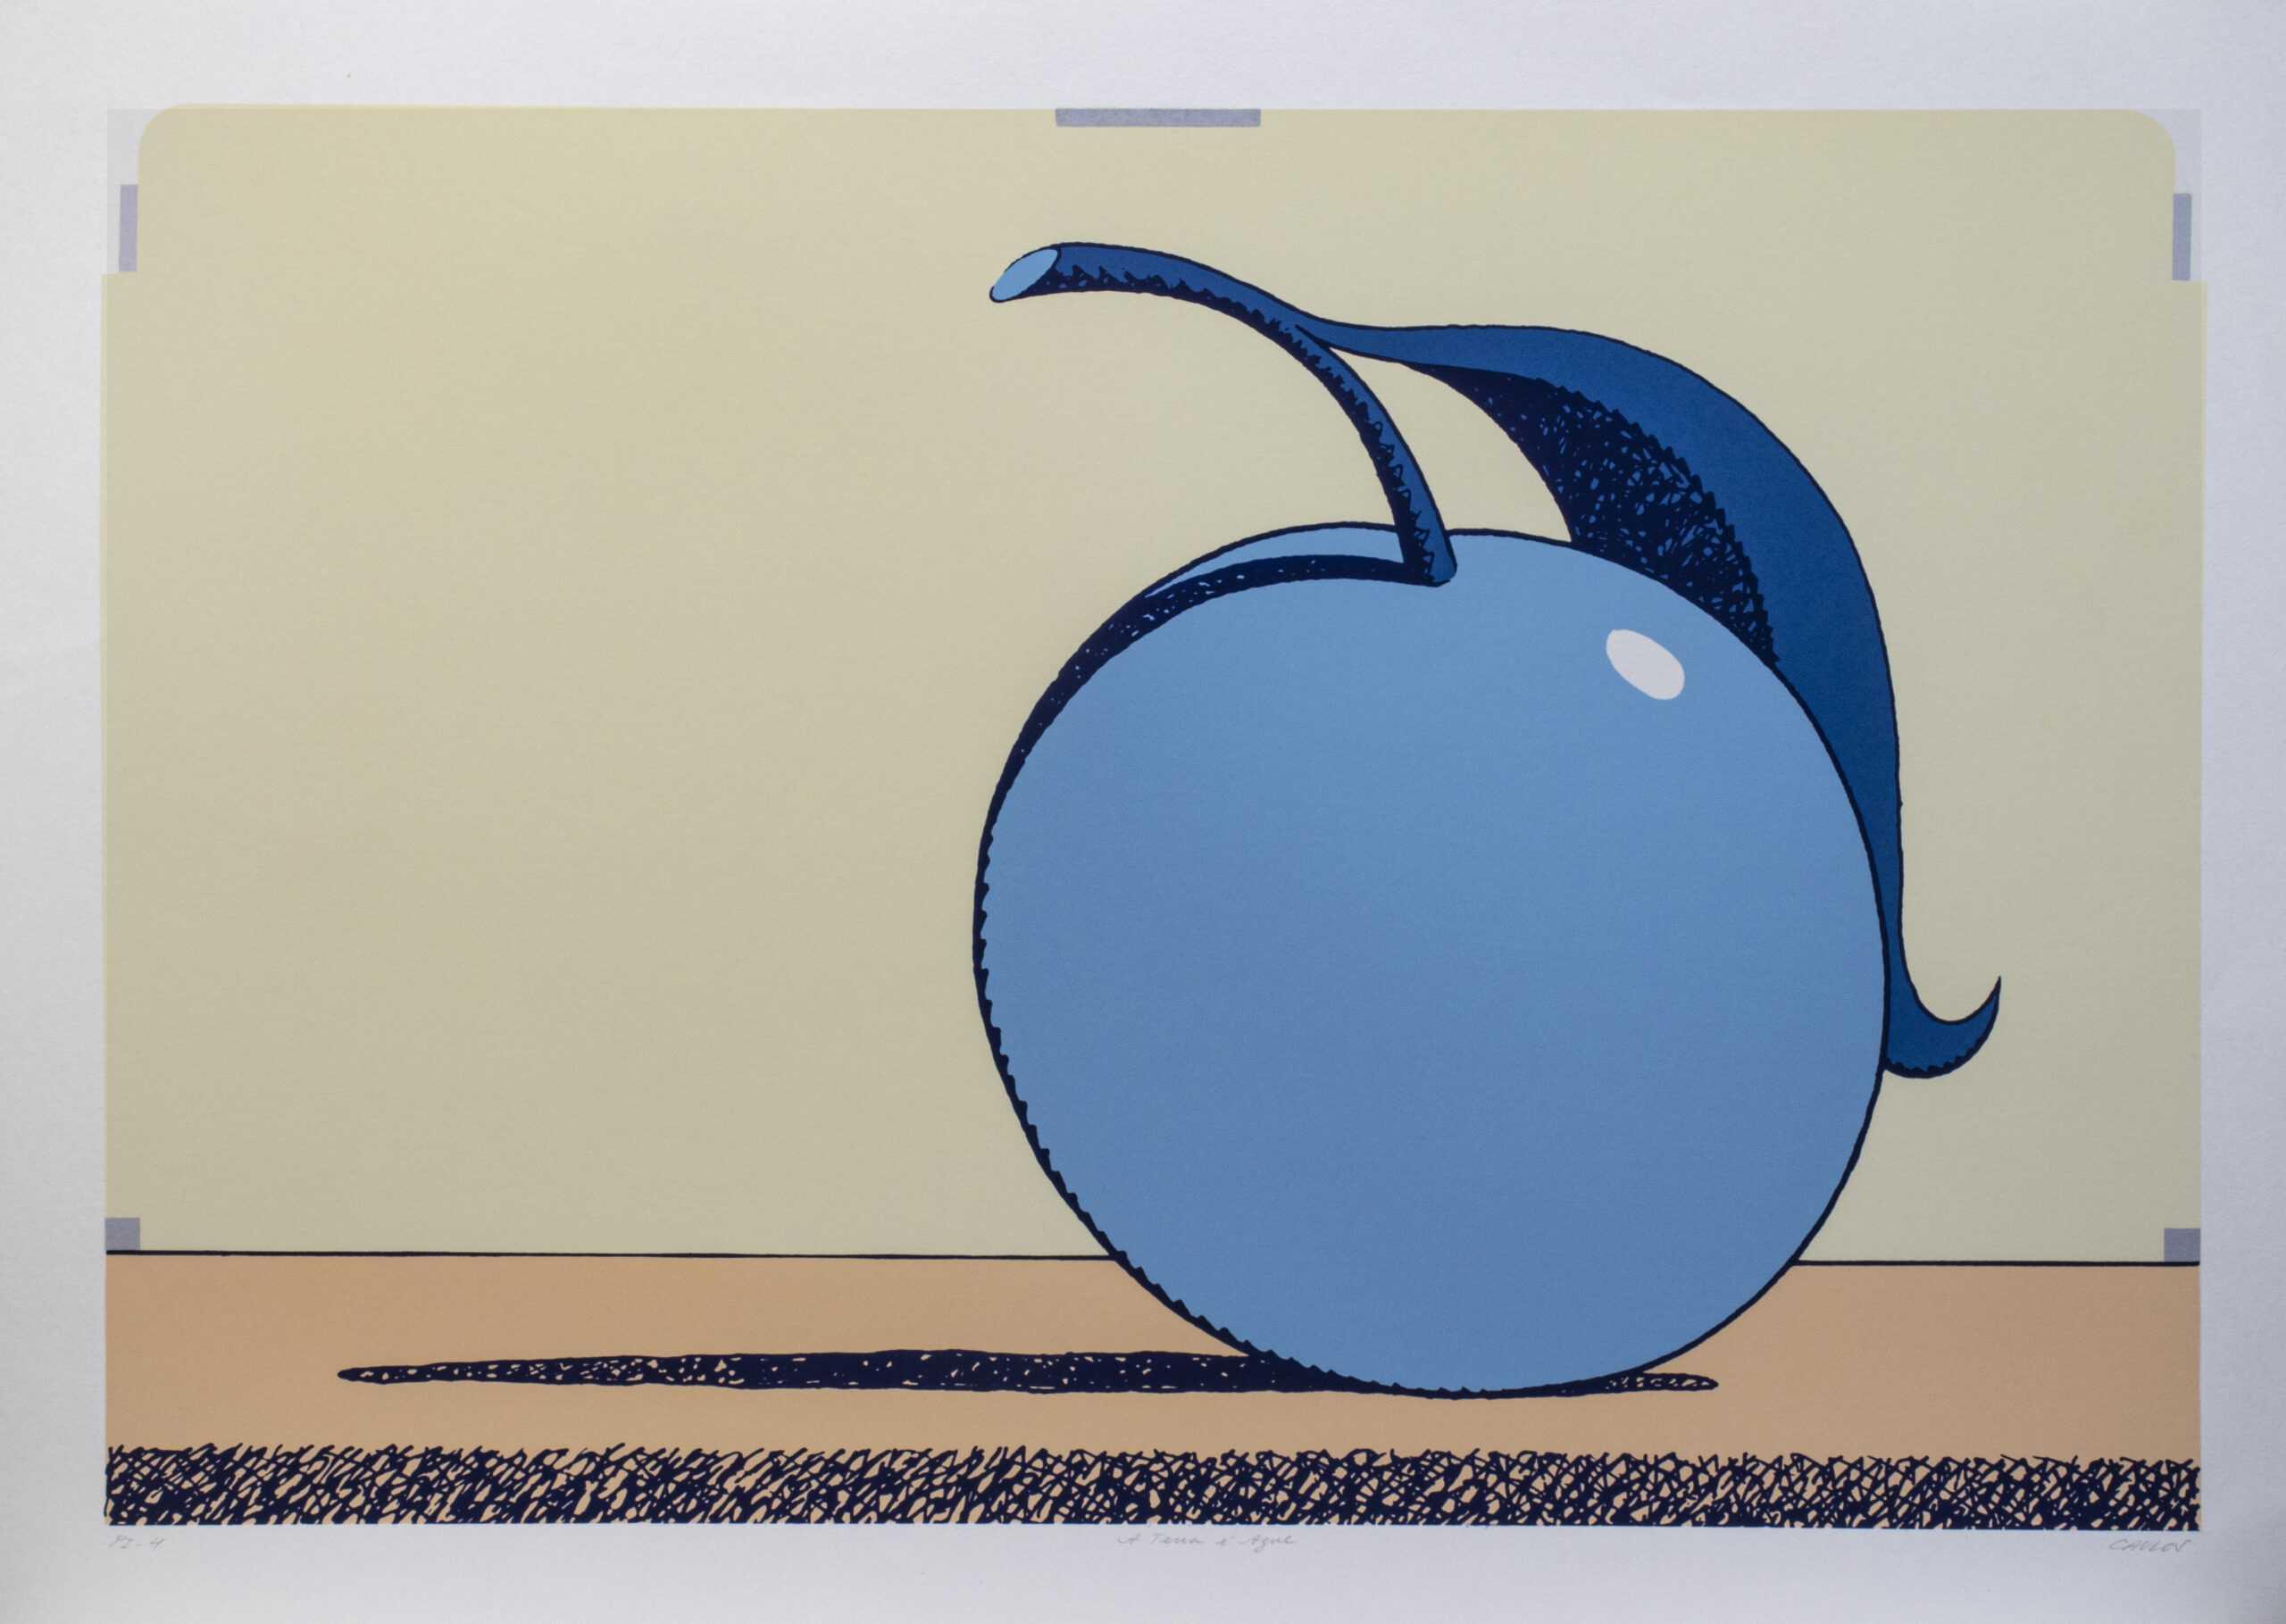 622 - Caulos - 50x70cm - Serigrafia (2)